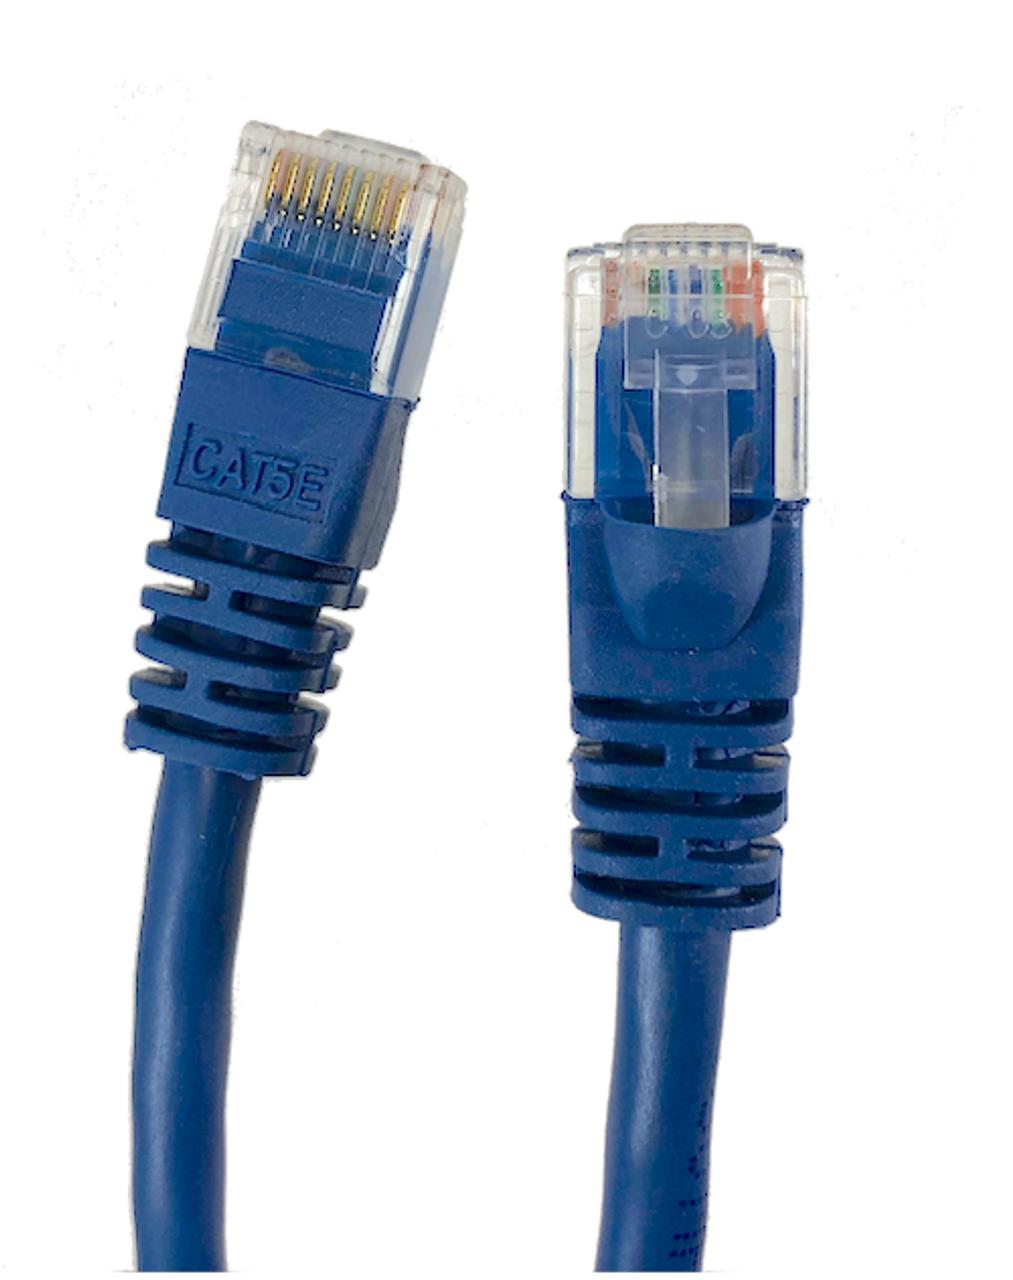 Category 5E UTP RJ45 Patch Cable Blue - 1 ft